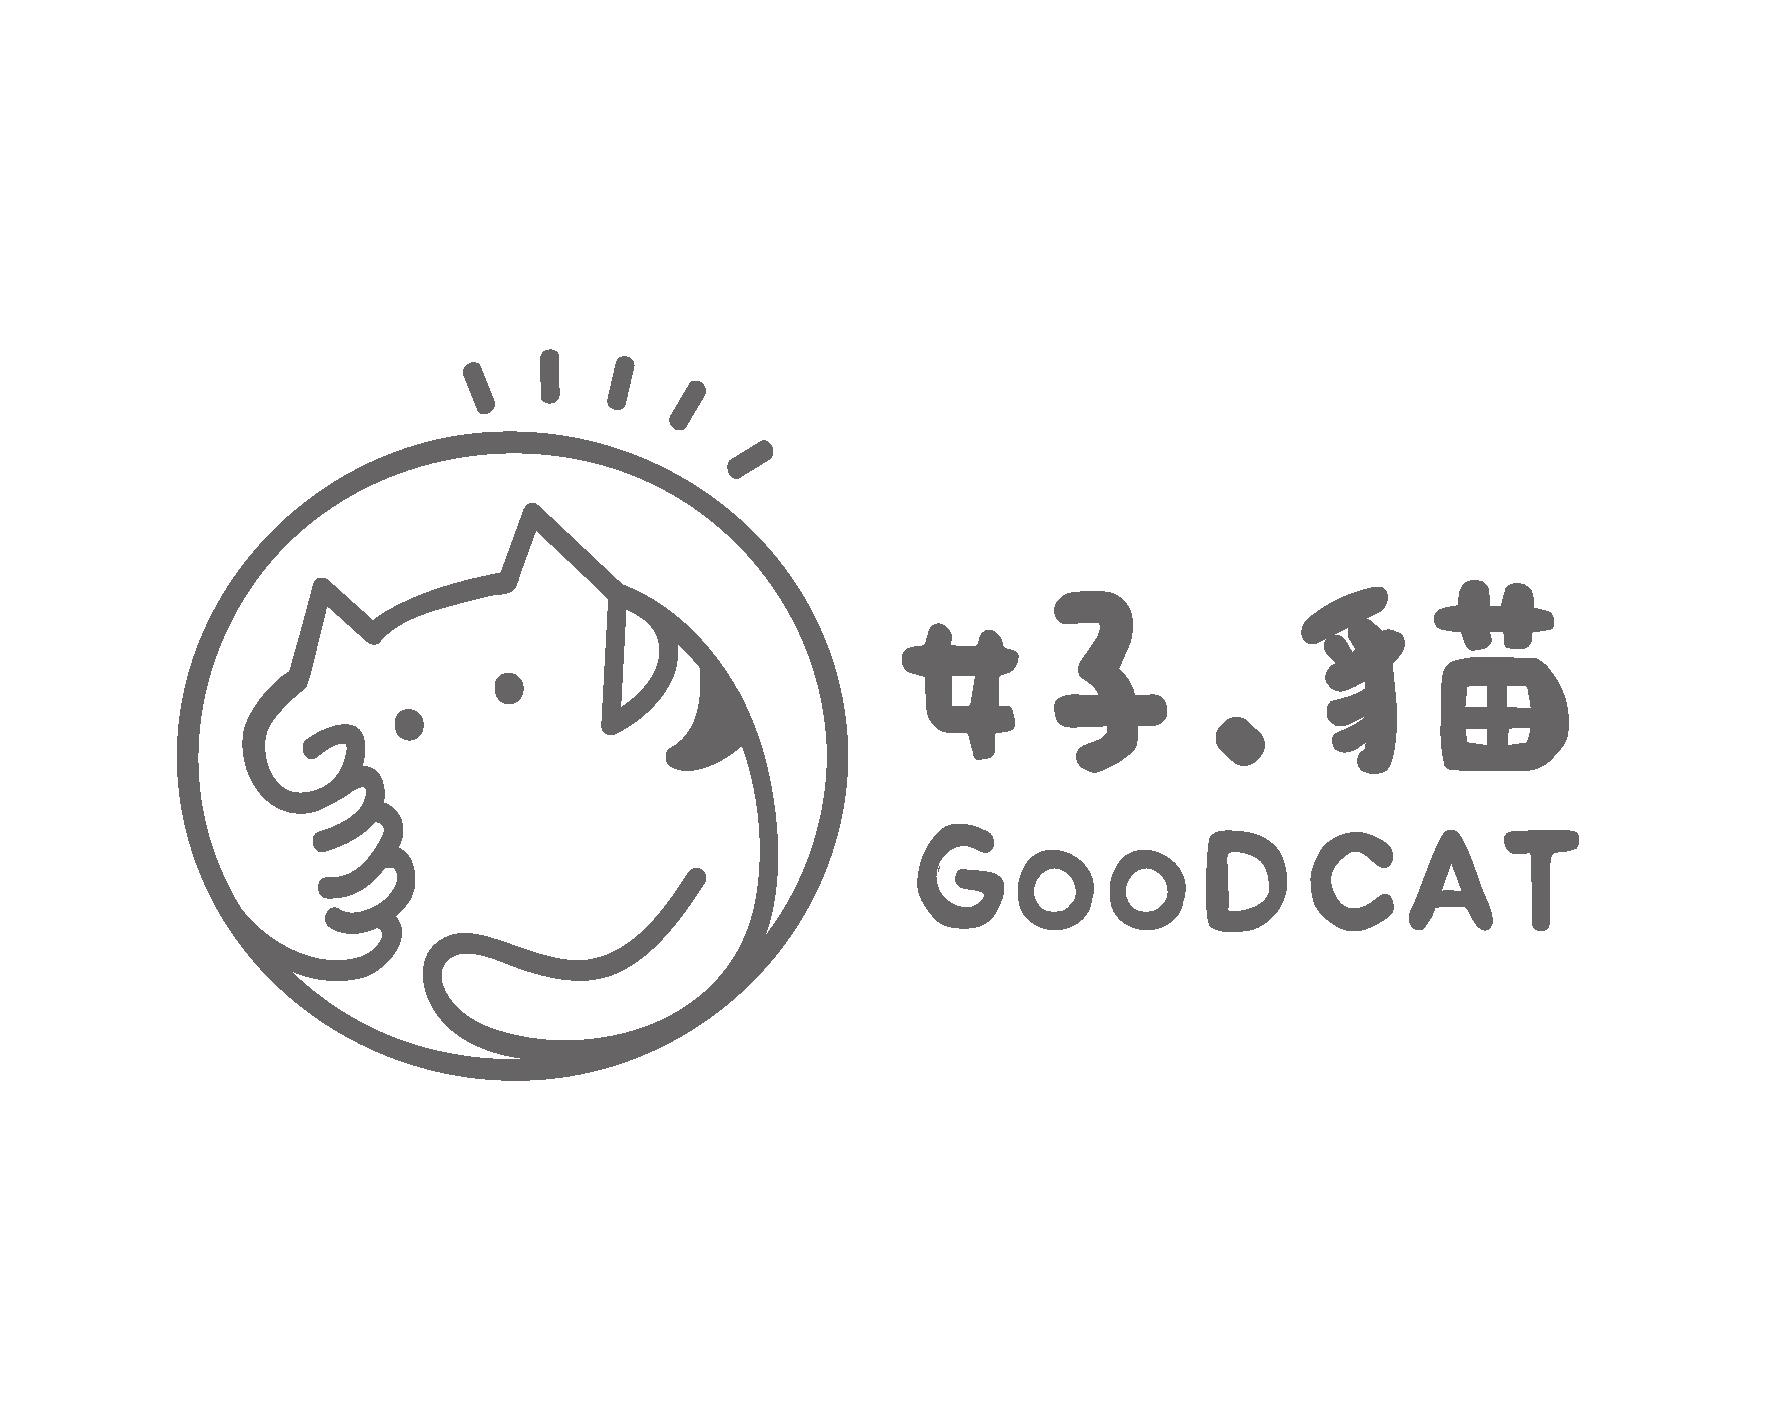 好貓GoodCat Logo